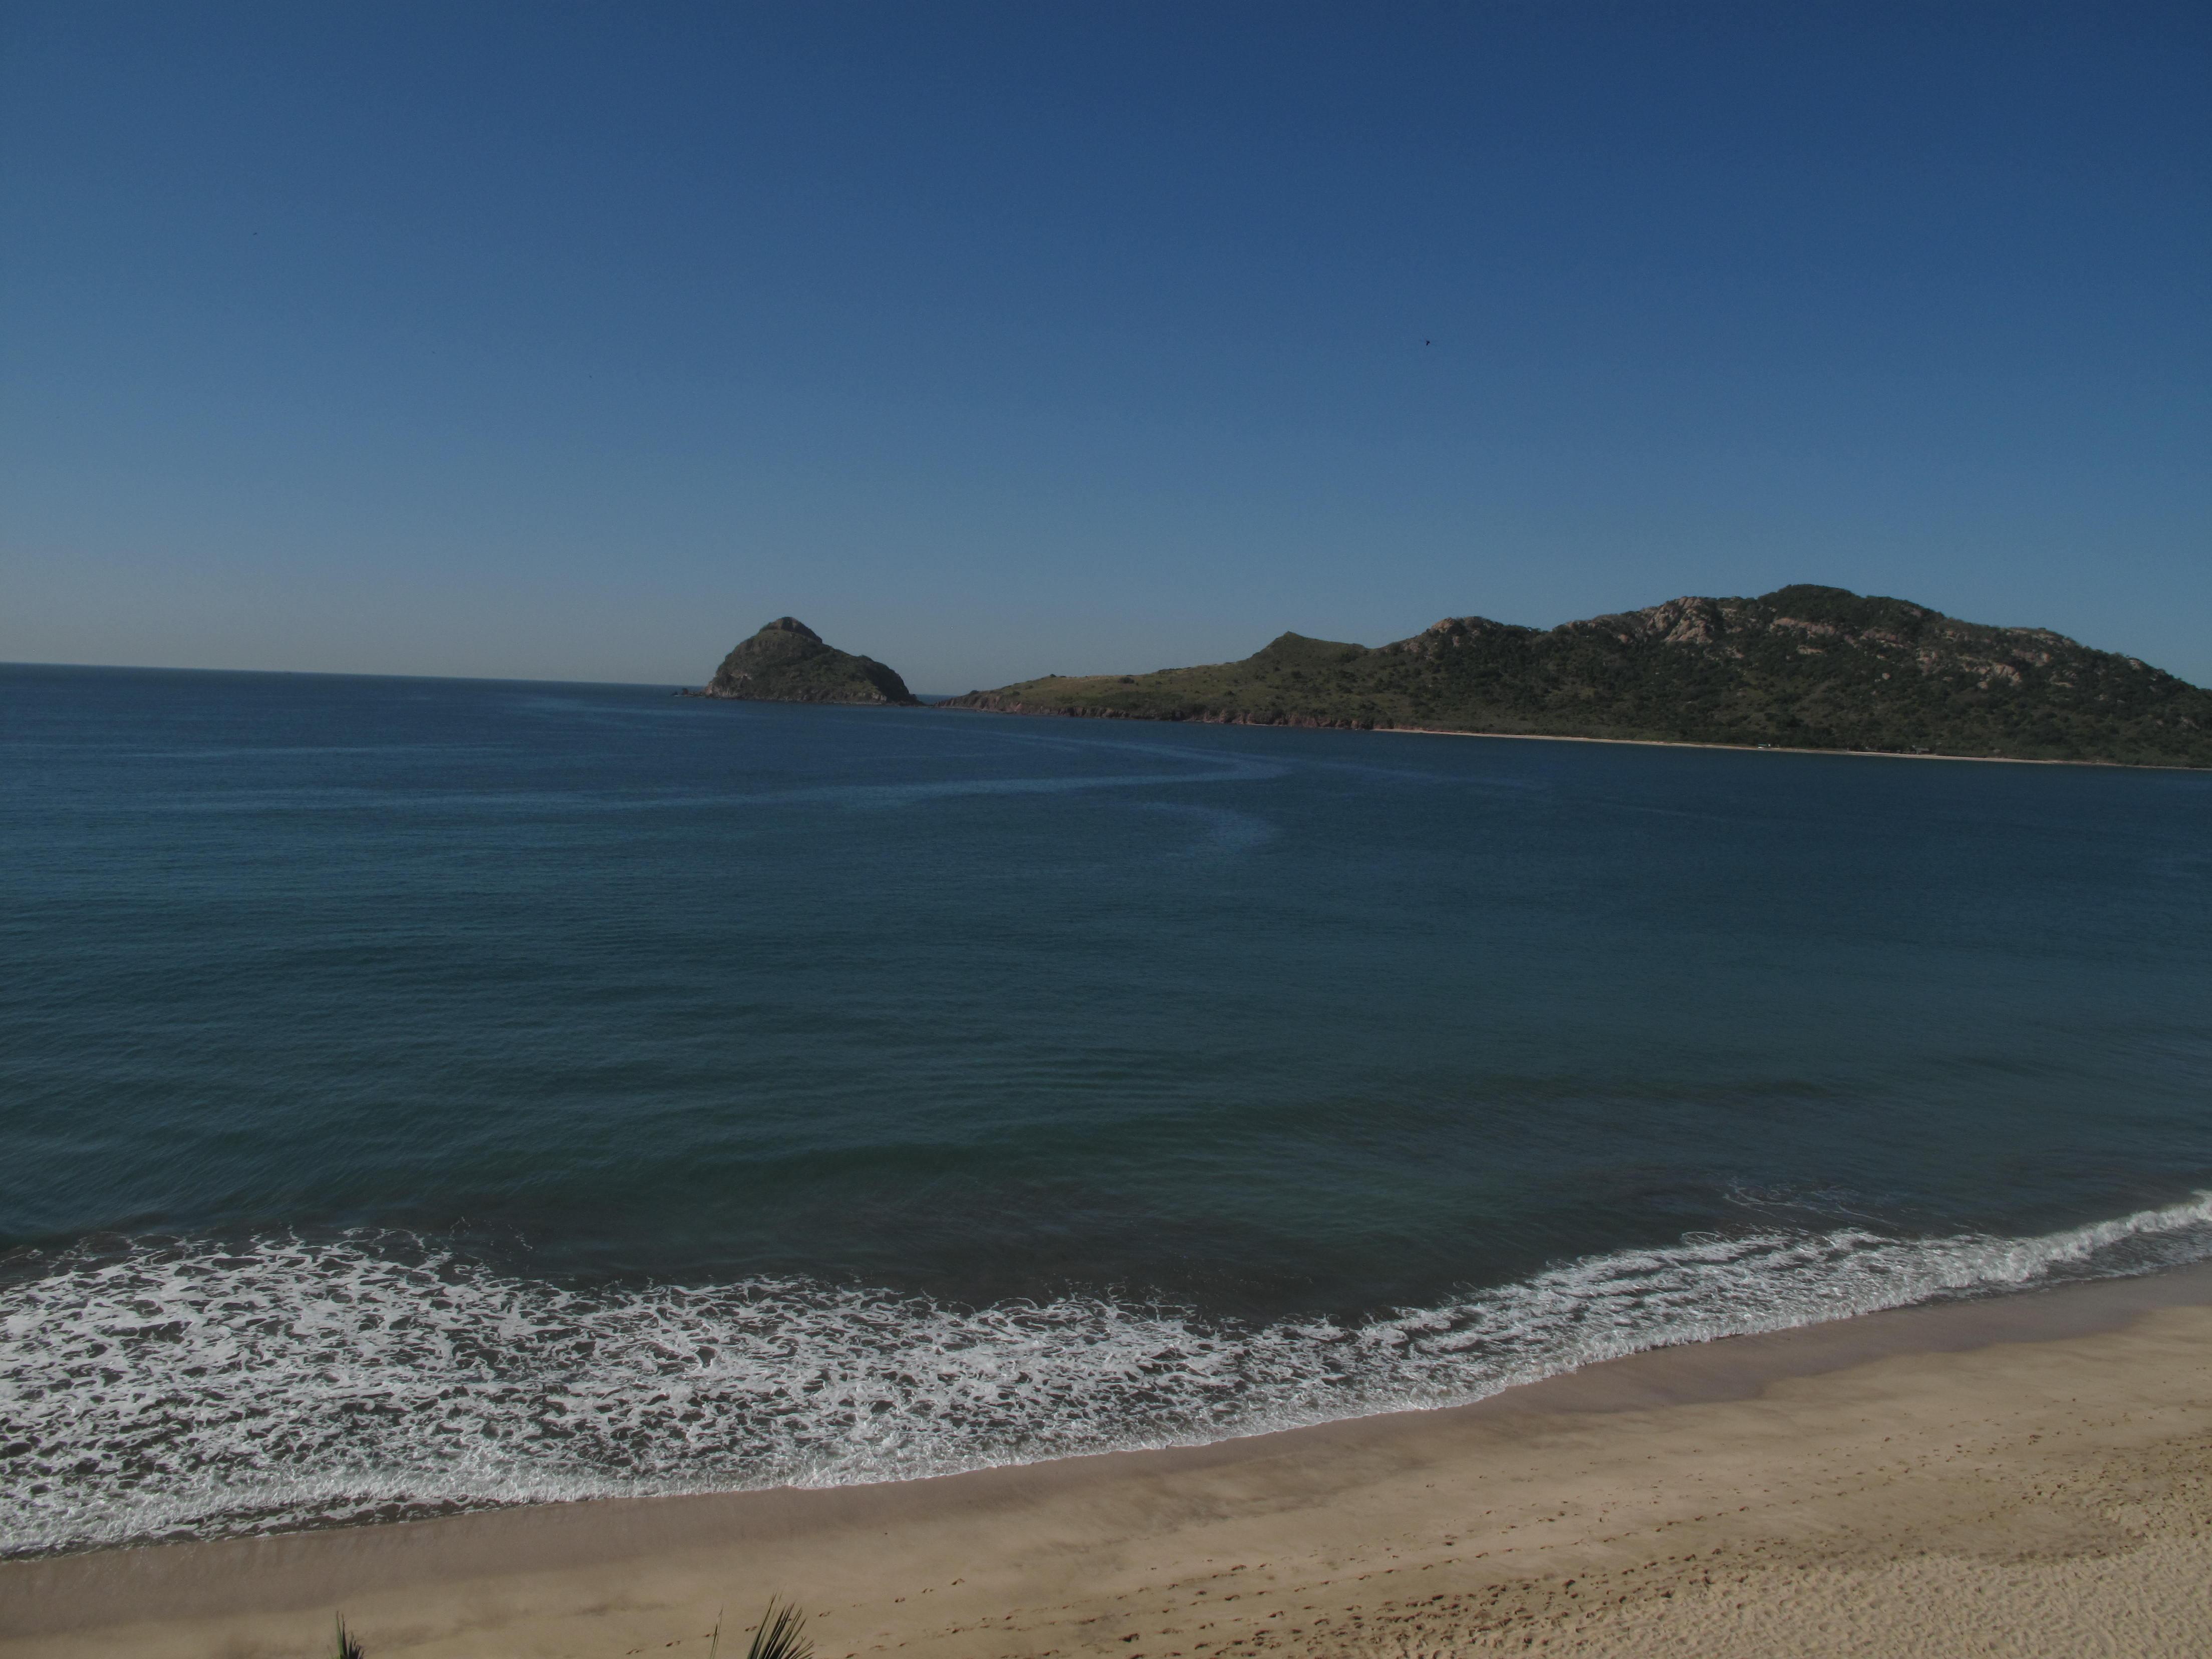 The beach at the Hotel Playa Mazatlan